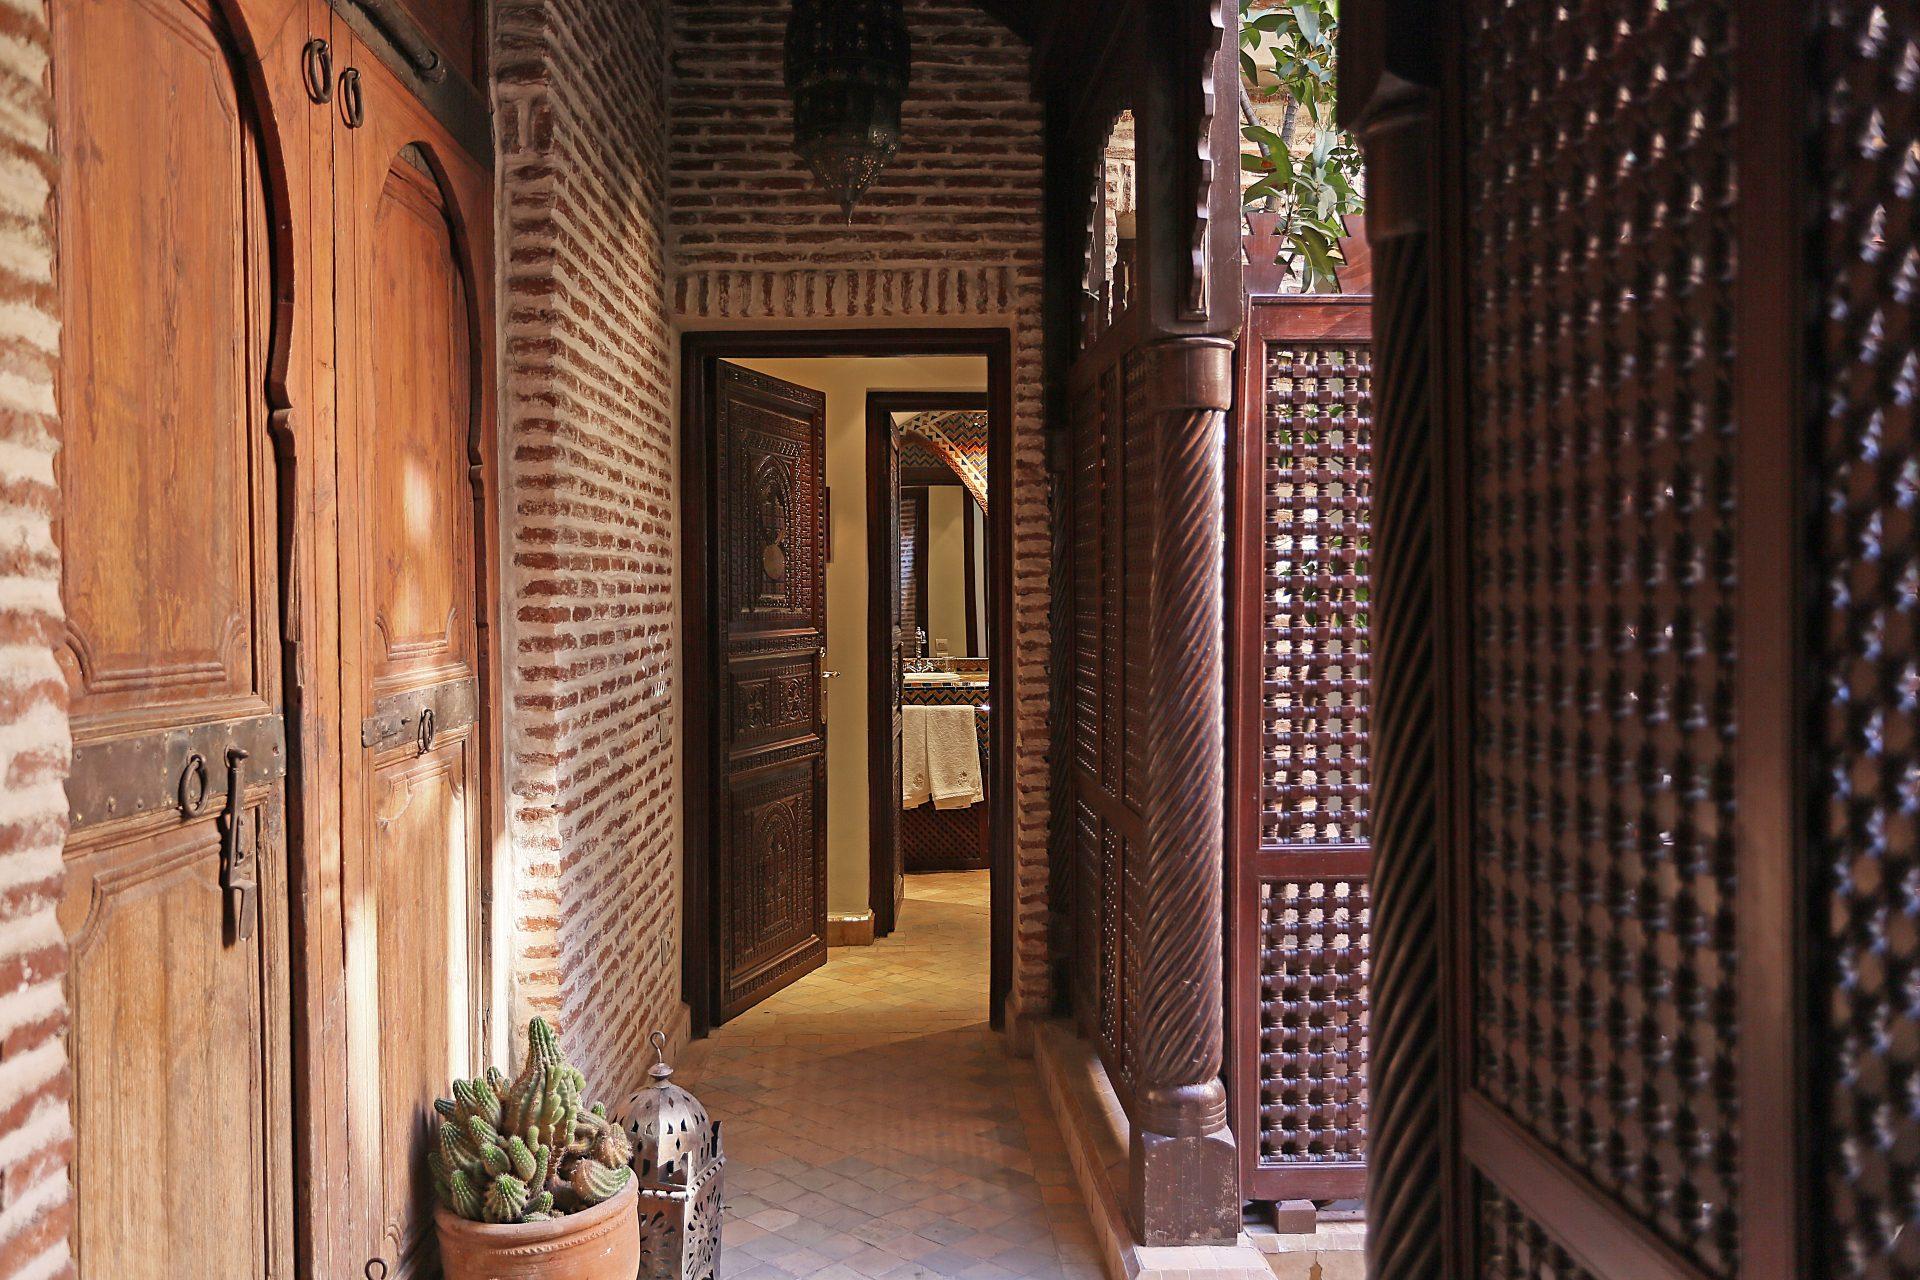 La maison arabe, Marrakech.